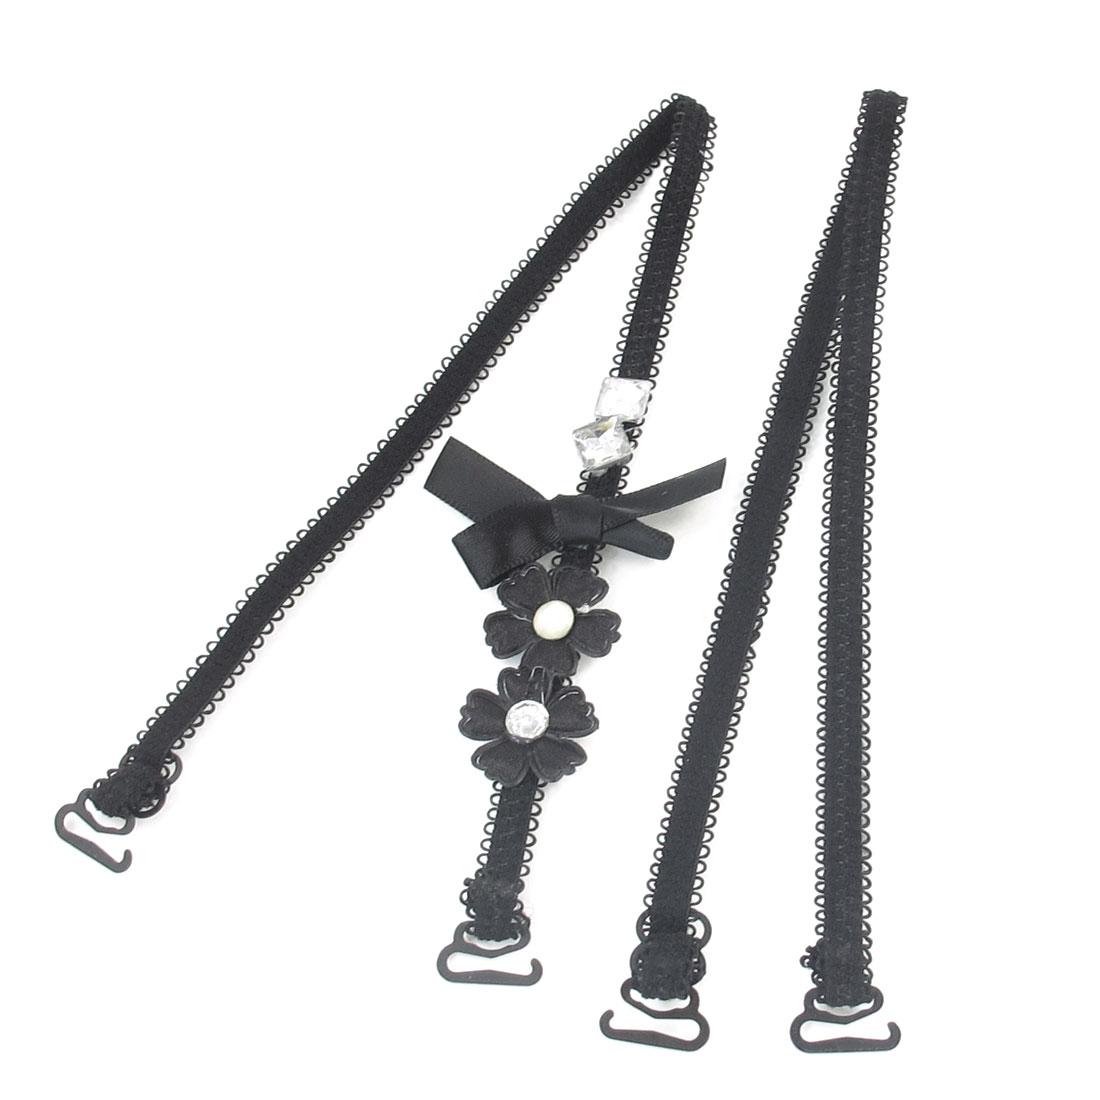 Ladies Flower Rhinestones Decor Adjustable Band Bra Shoulder Strap Black 2PCS